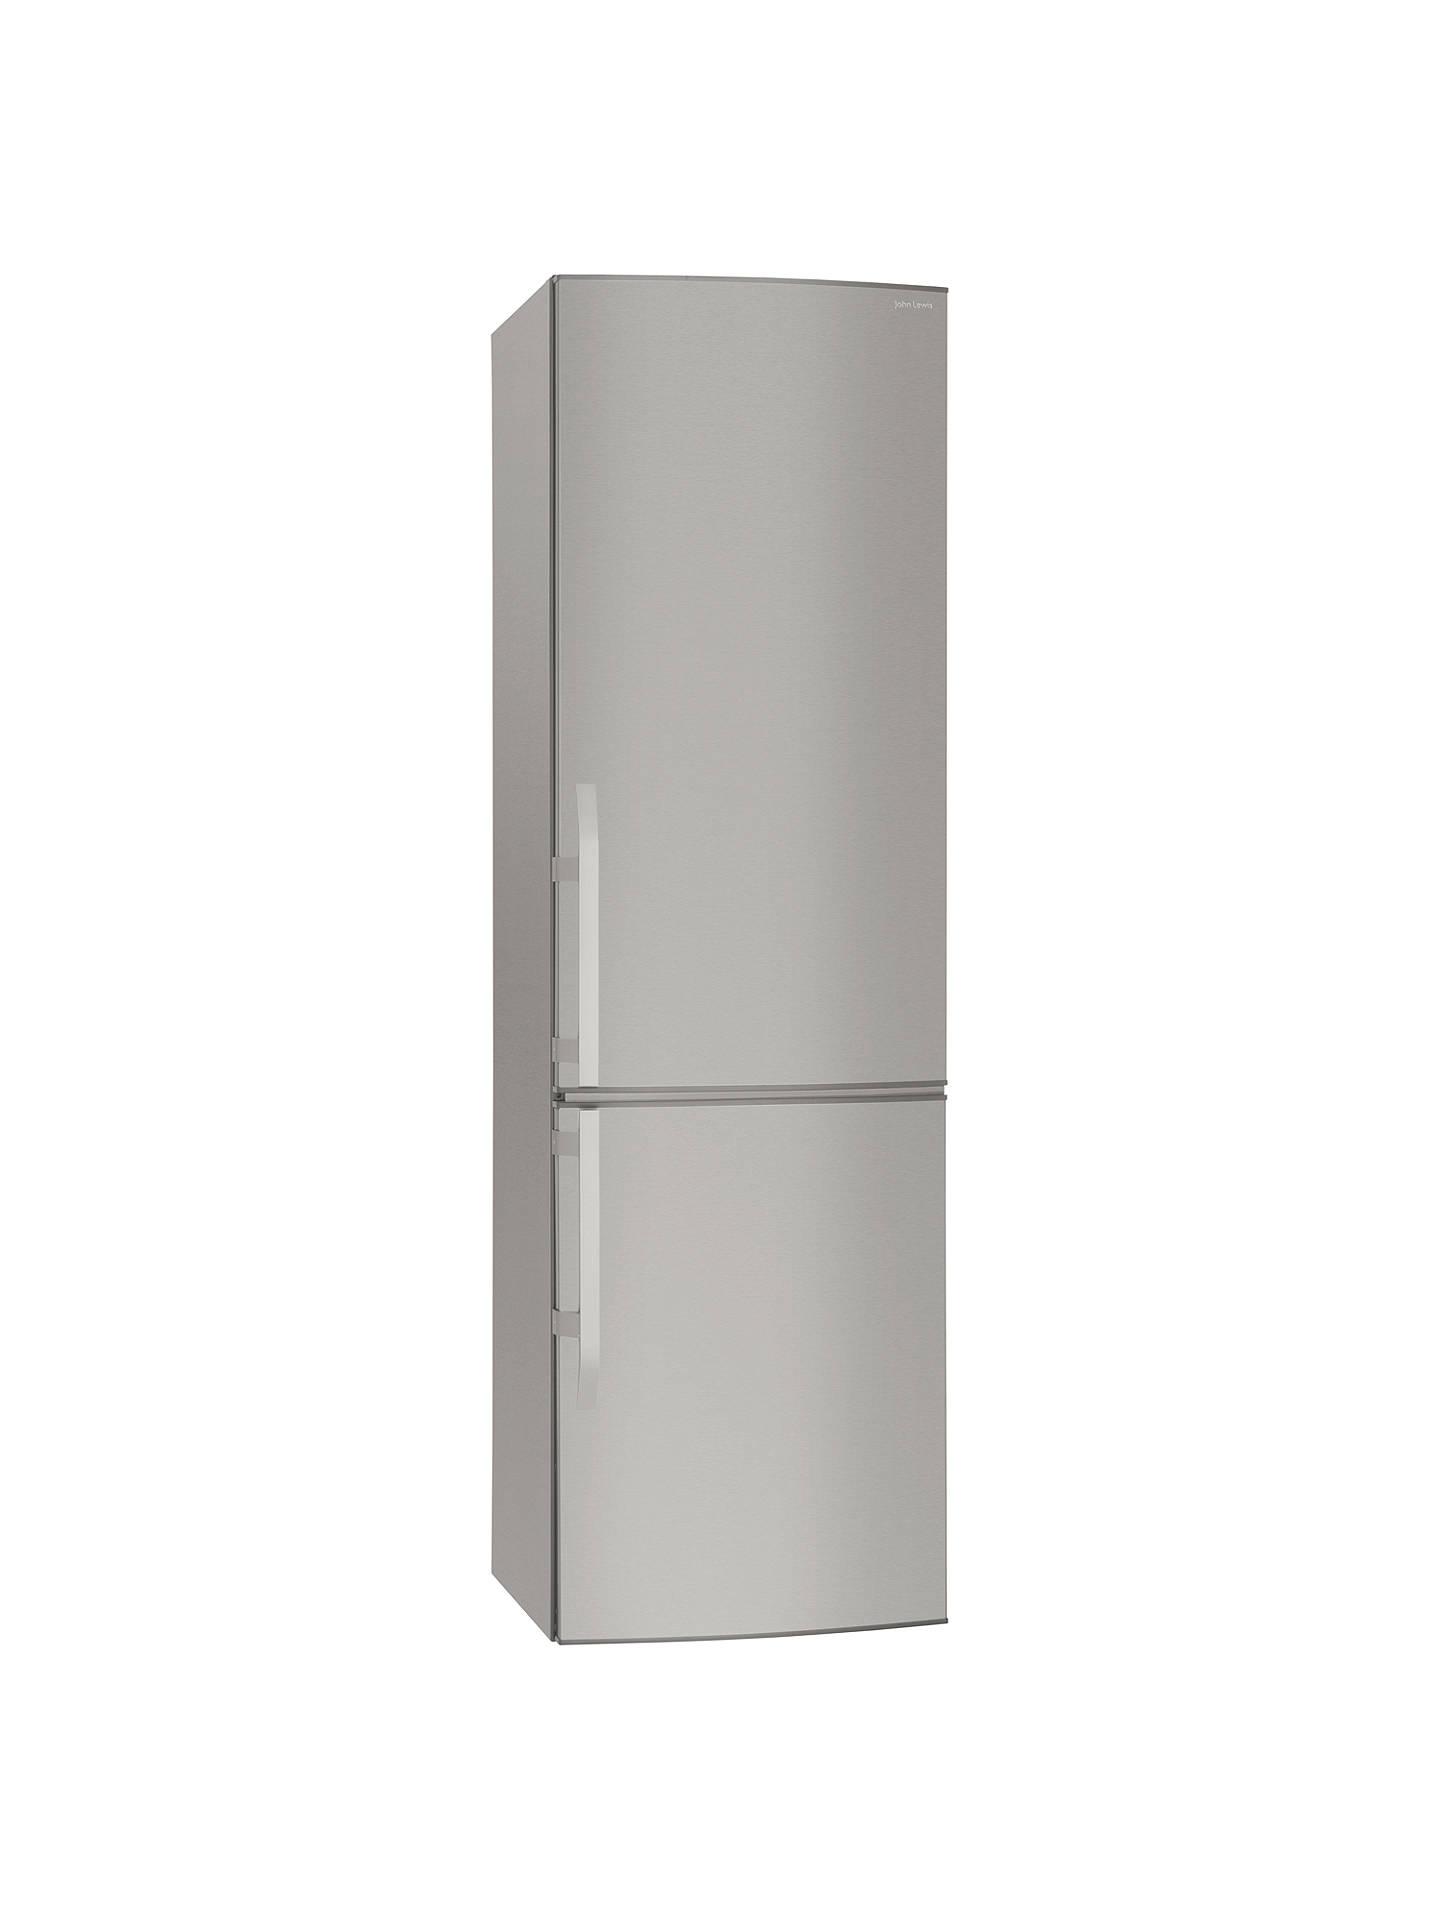 john lewis partners jlffs2020 fridge freezer a energy. Black Bedroom Furniture Sets. Home Design Ideas